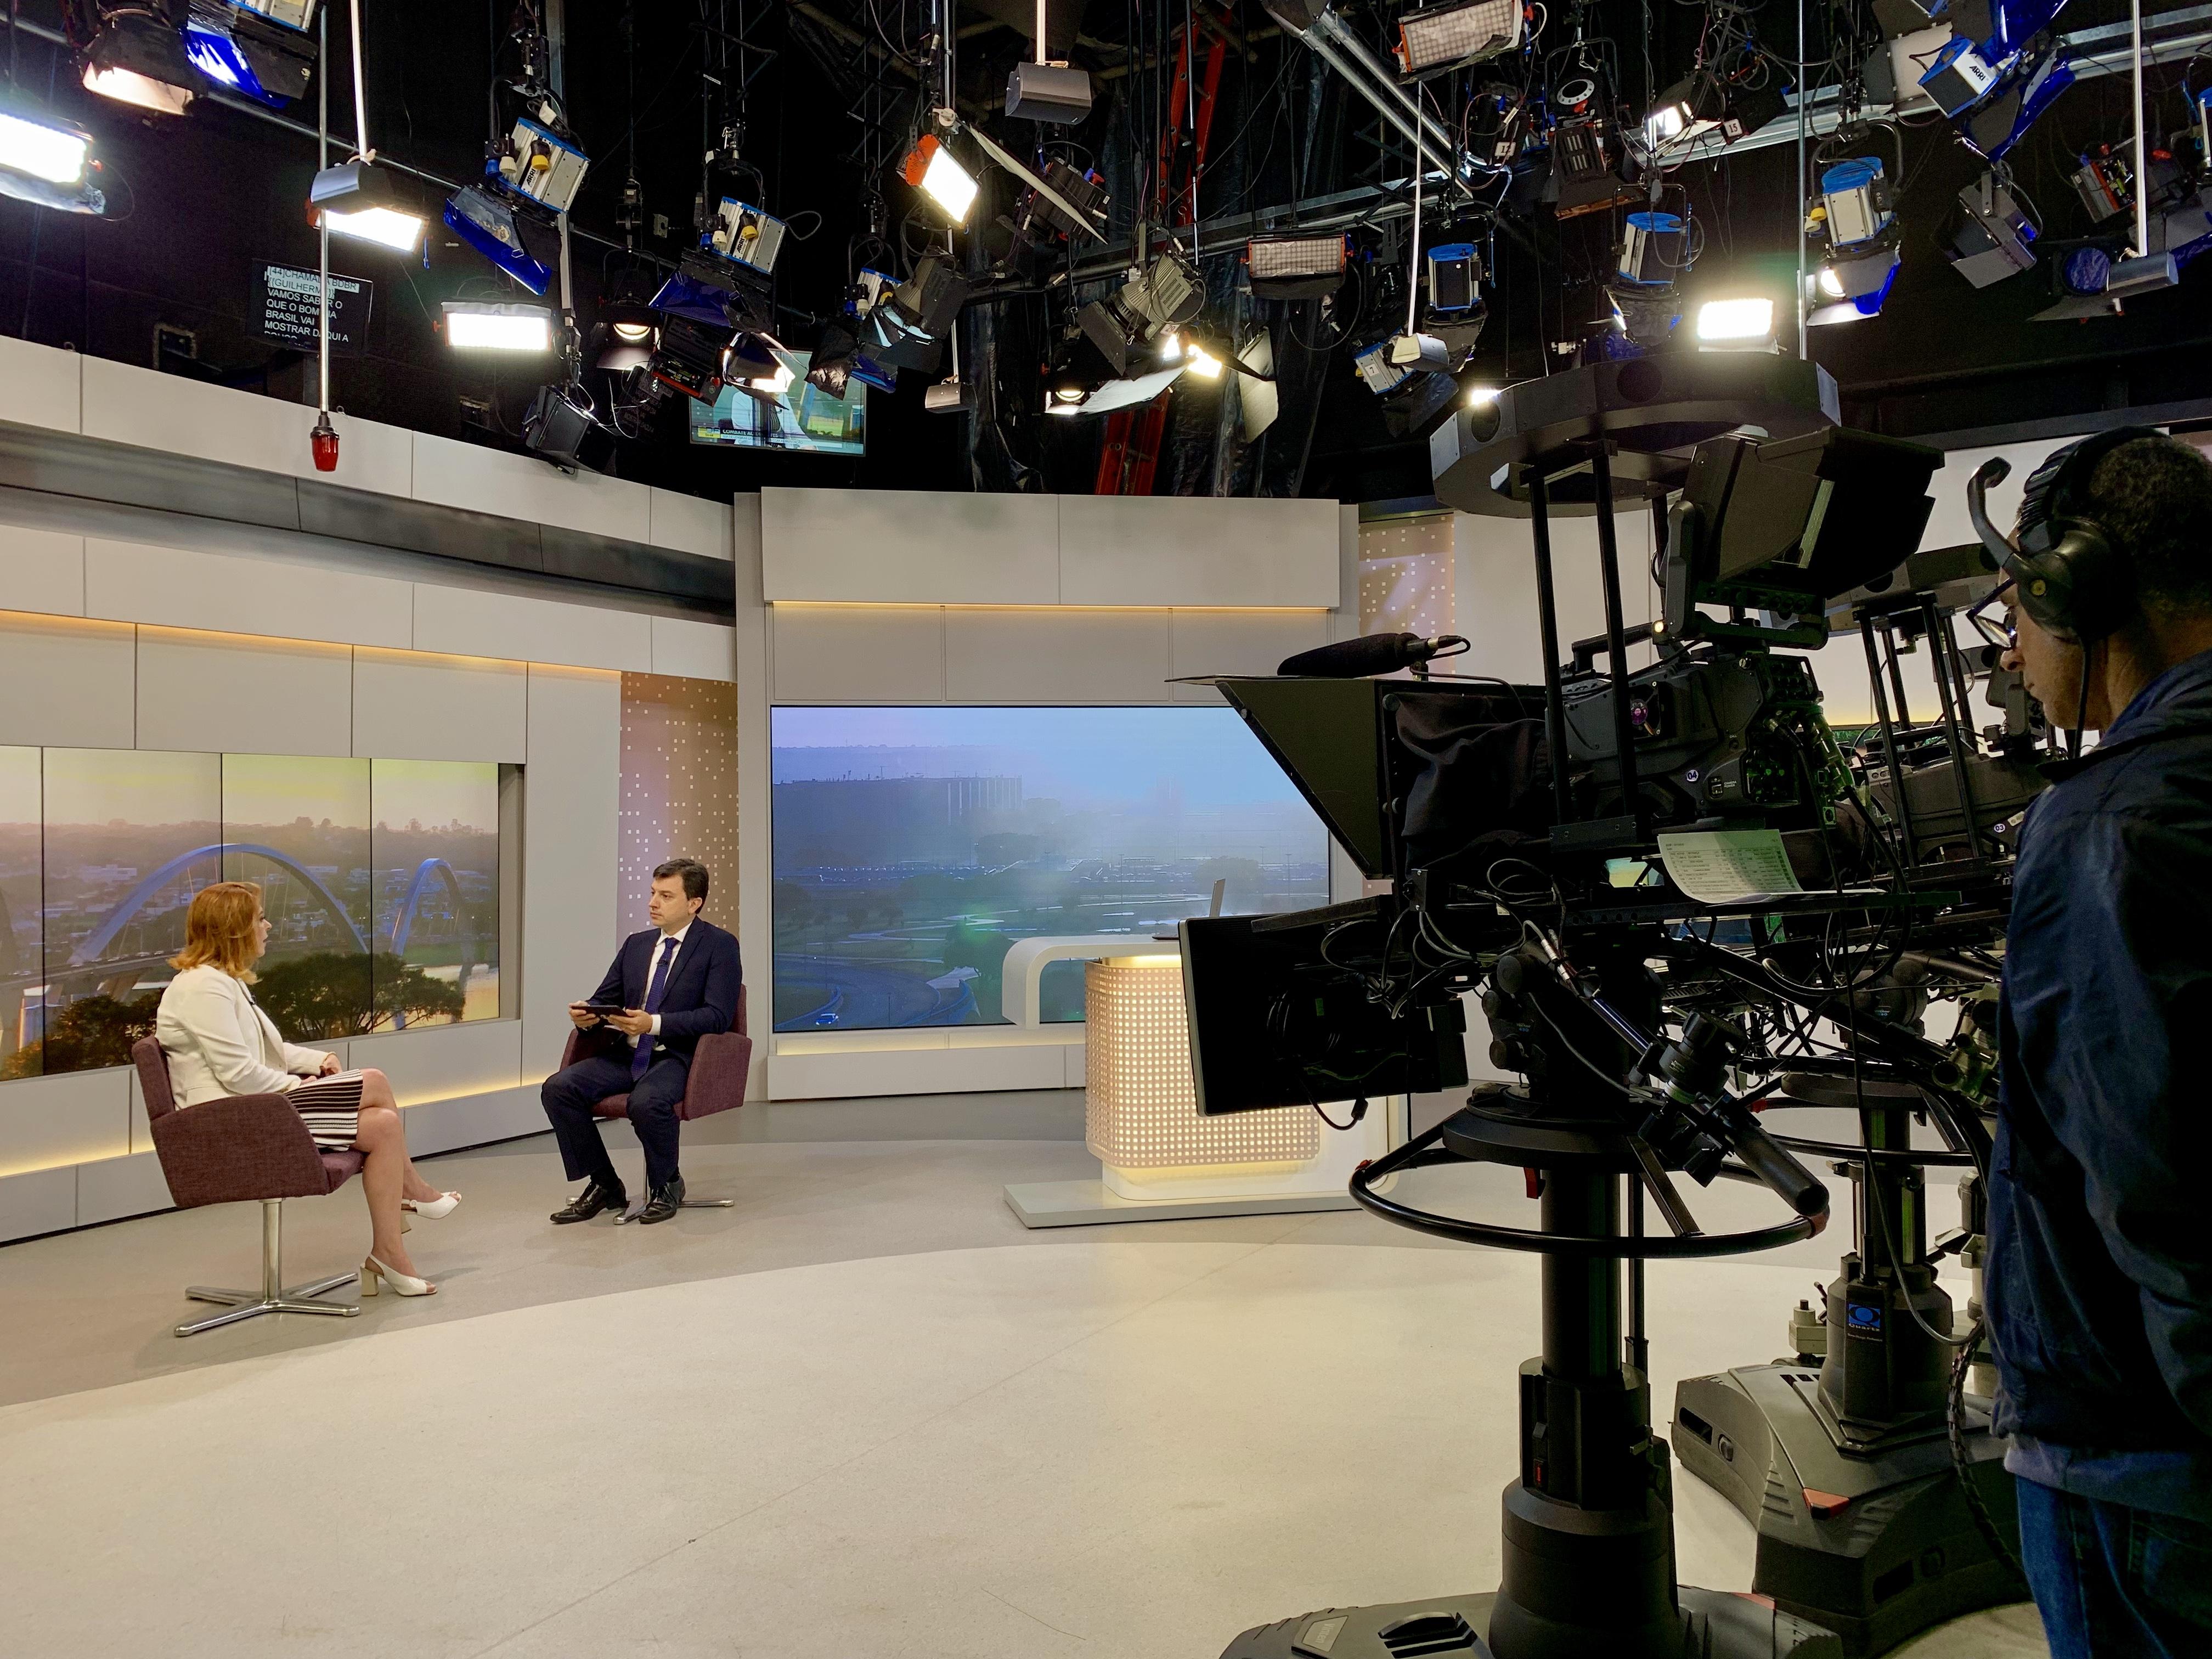 TV Globo - Dra. Patrícia Brunck HSLS - 14-11-2018 [2]